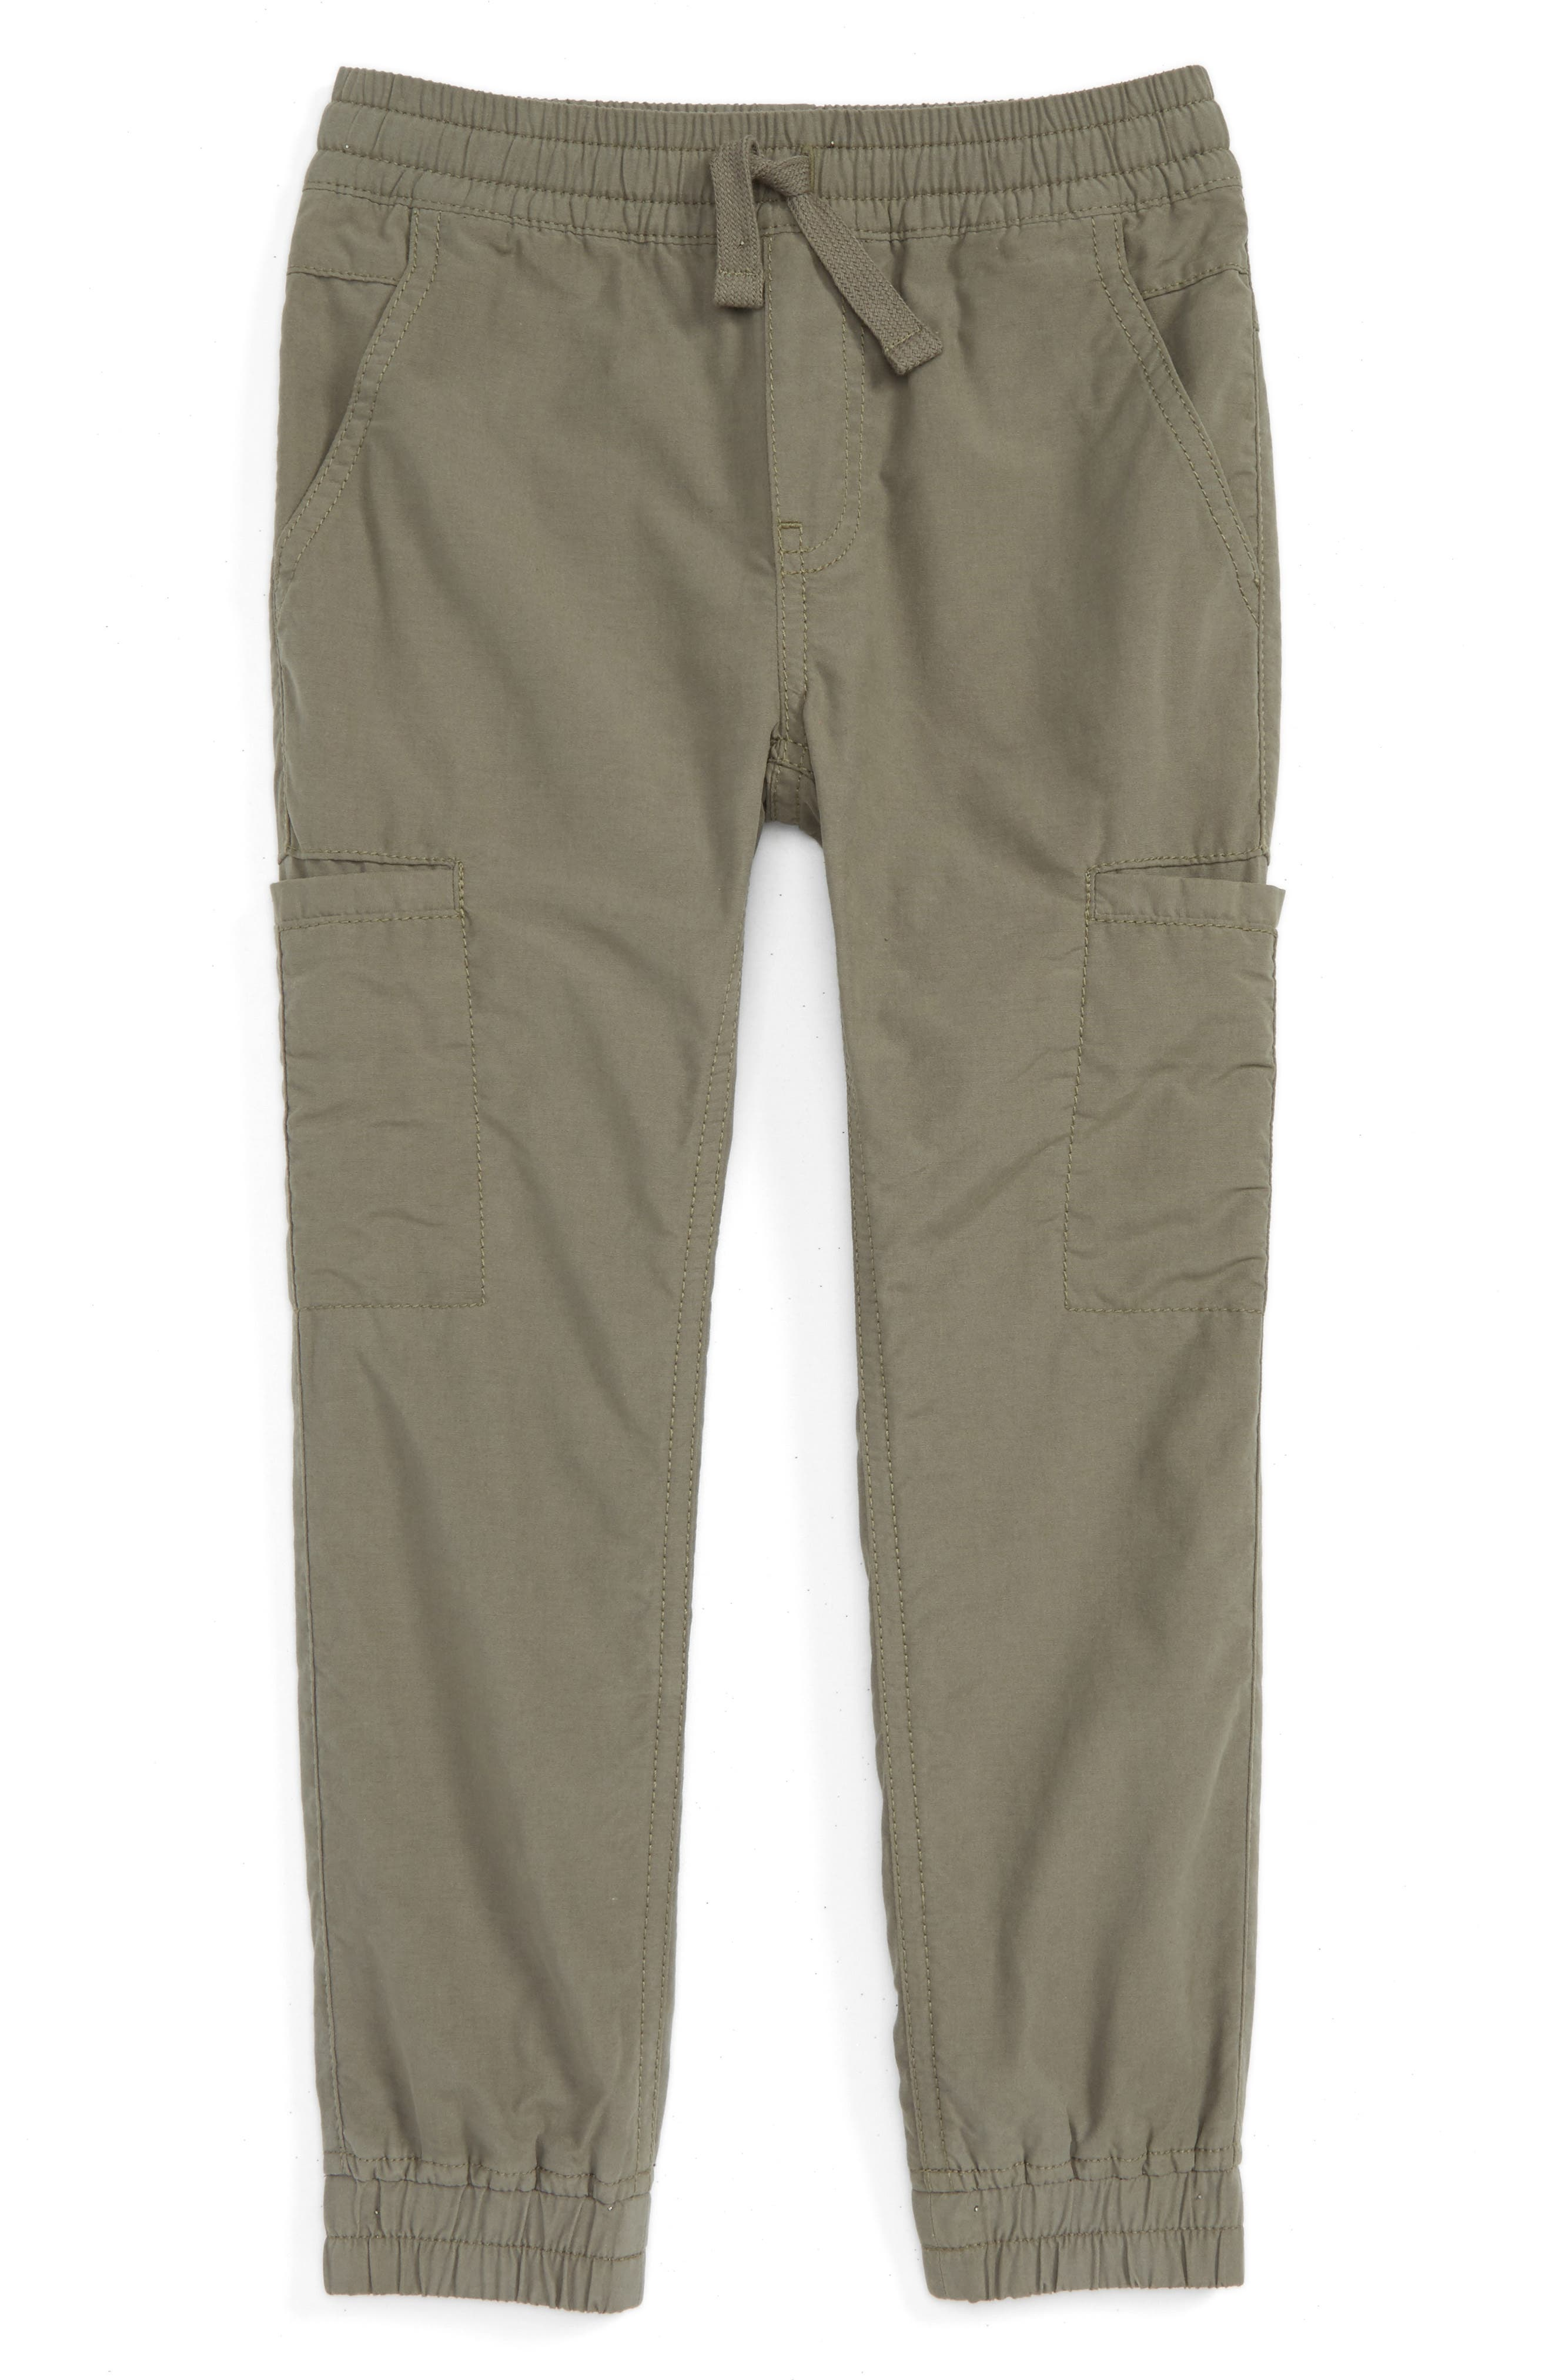 Tucker + Tate Lined Jogger Pants (Toddler Boys & Little Boys)